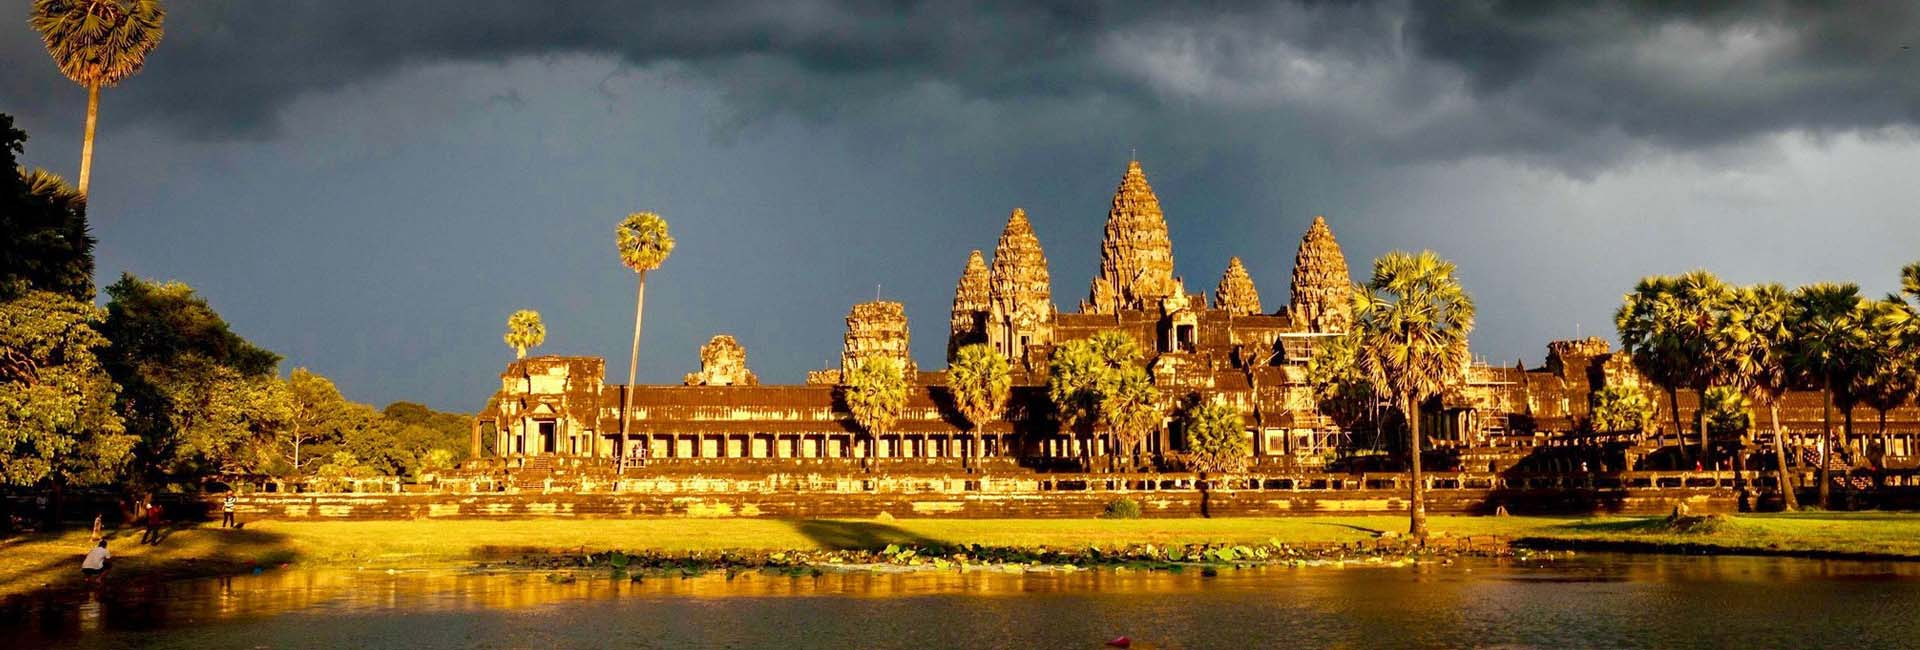 Vietnam Cambodia Tour Packages   Vietnam Cambodia tour from